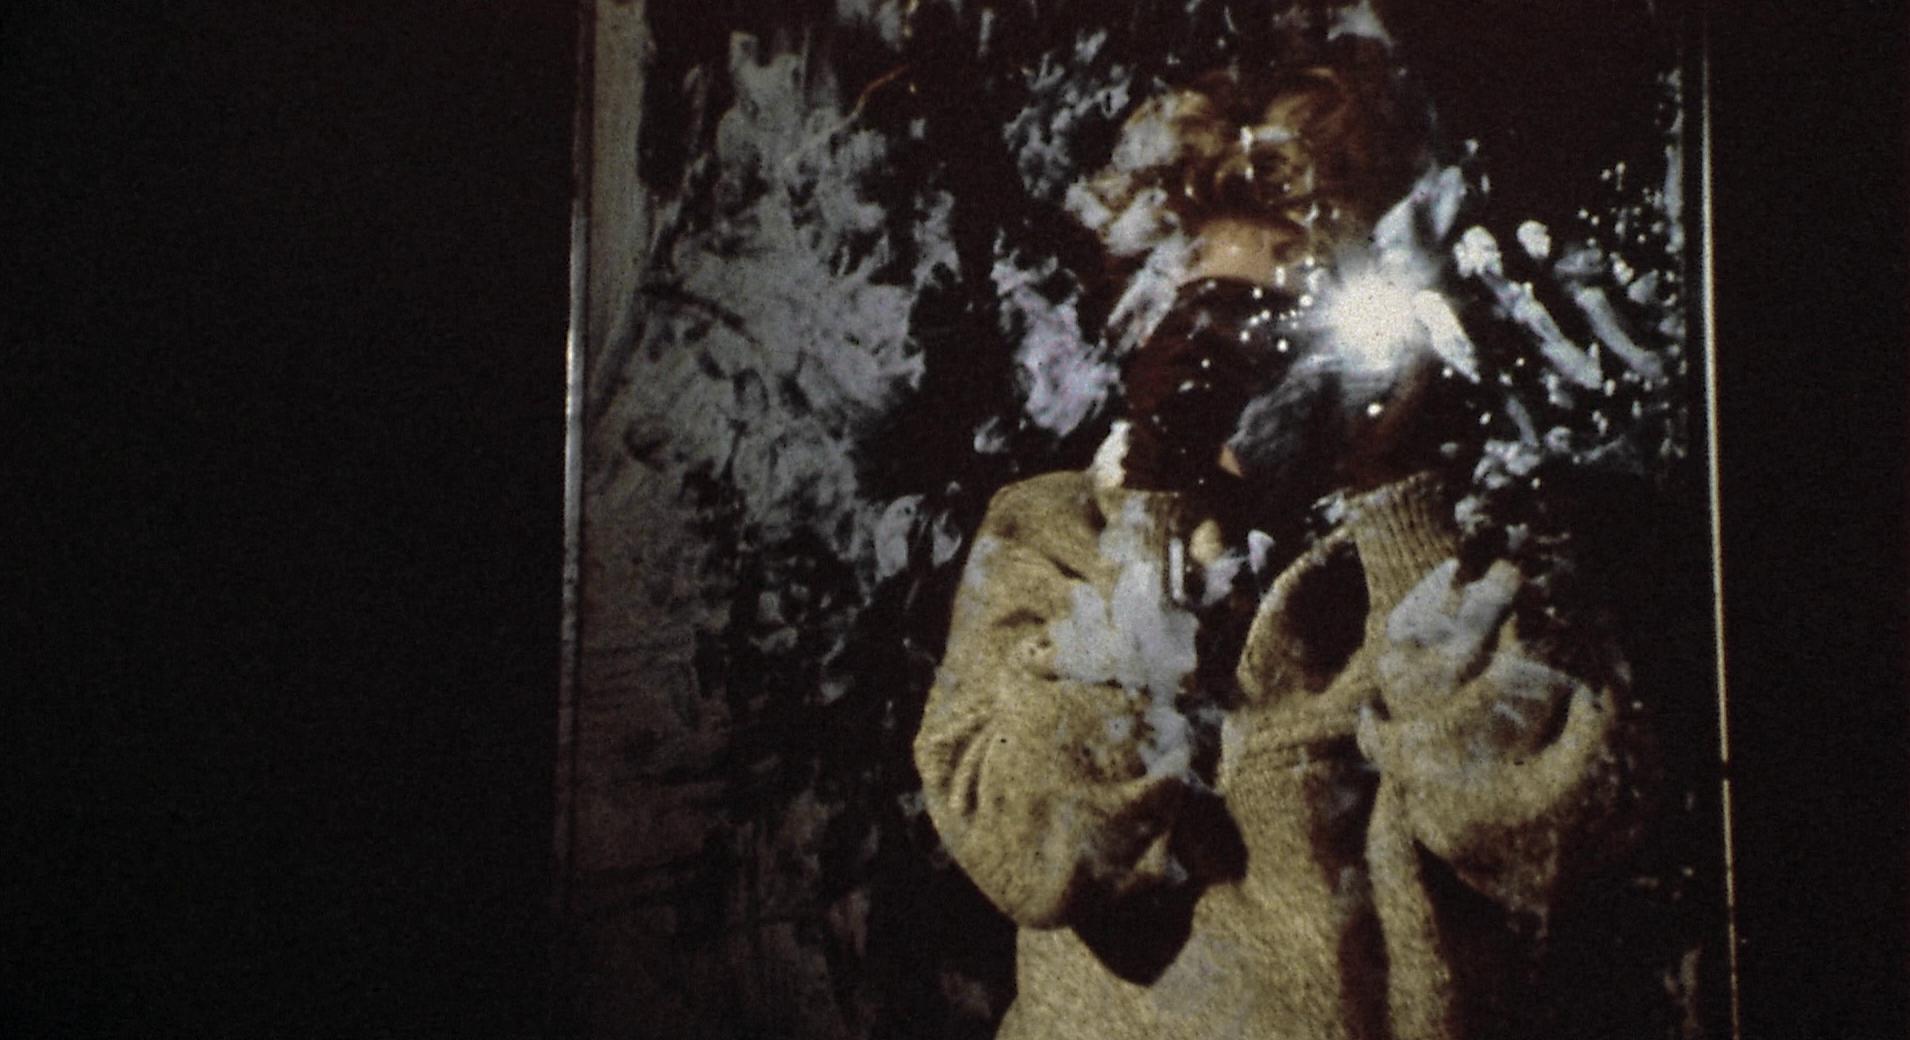 Candyman (Bernard Rose, 1992)